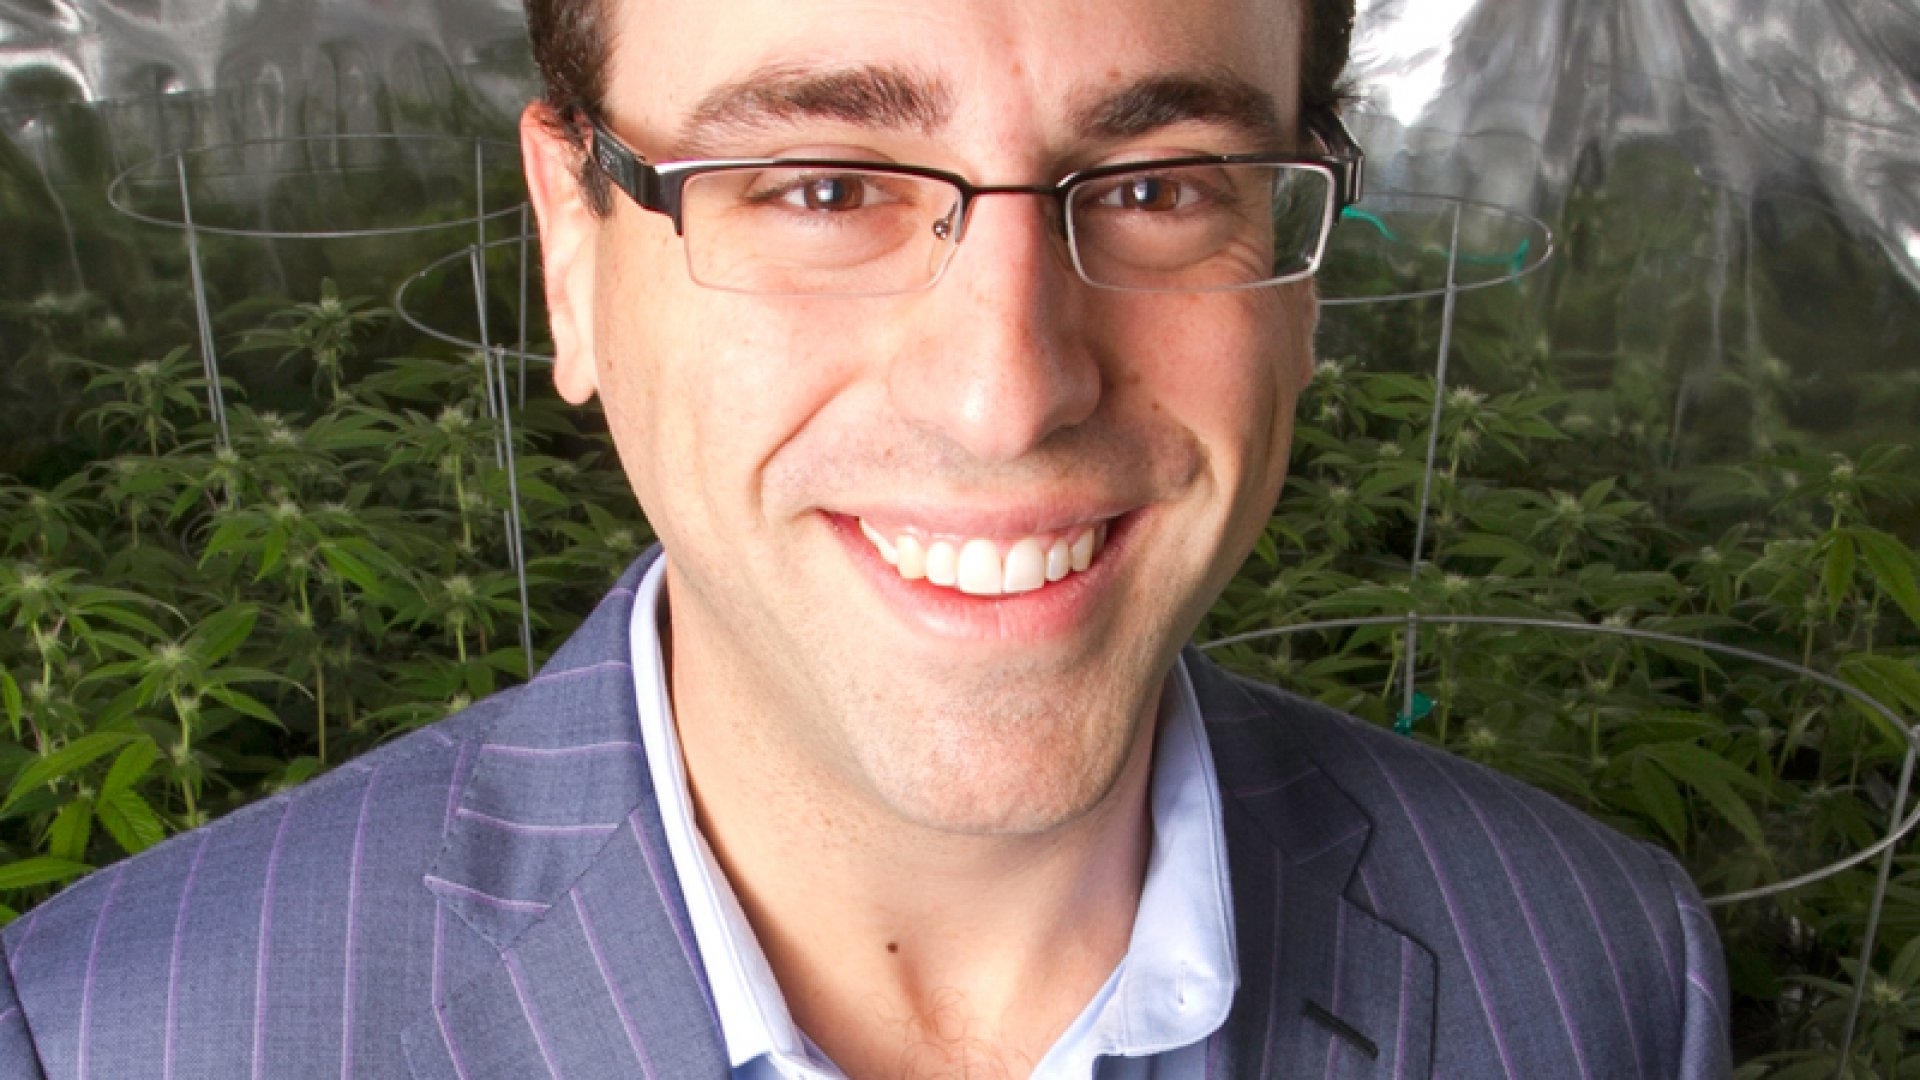 On a Mission to Build a Billion-Dollar Legal Marijuana Empire